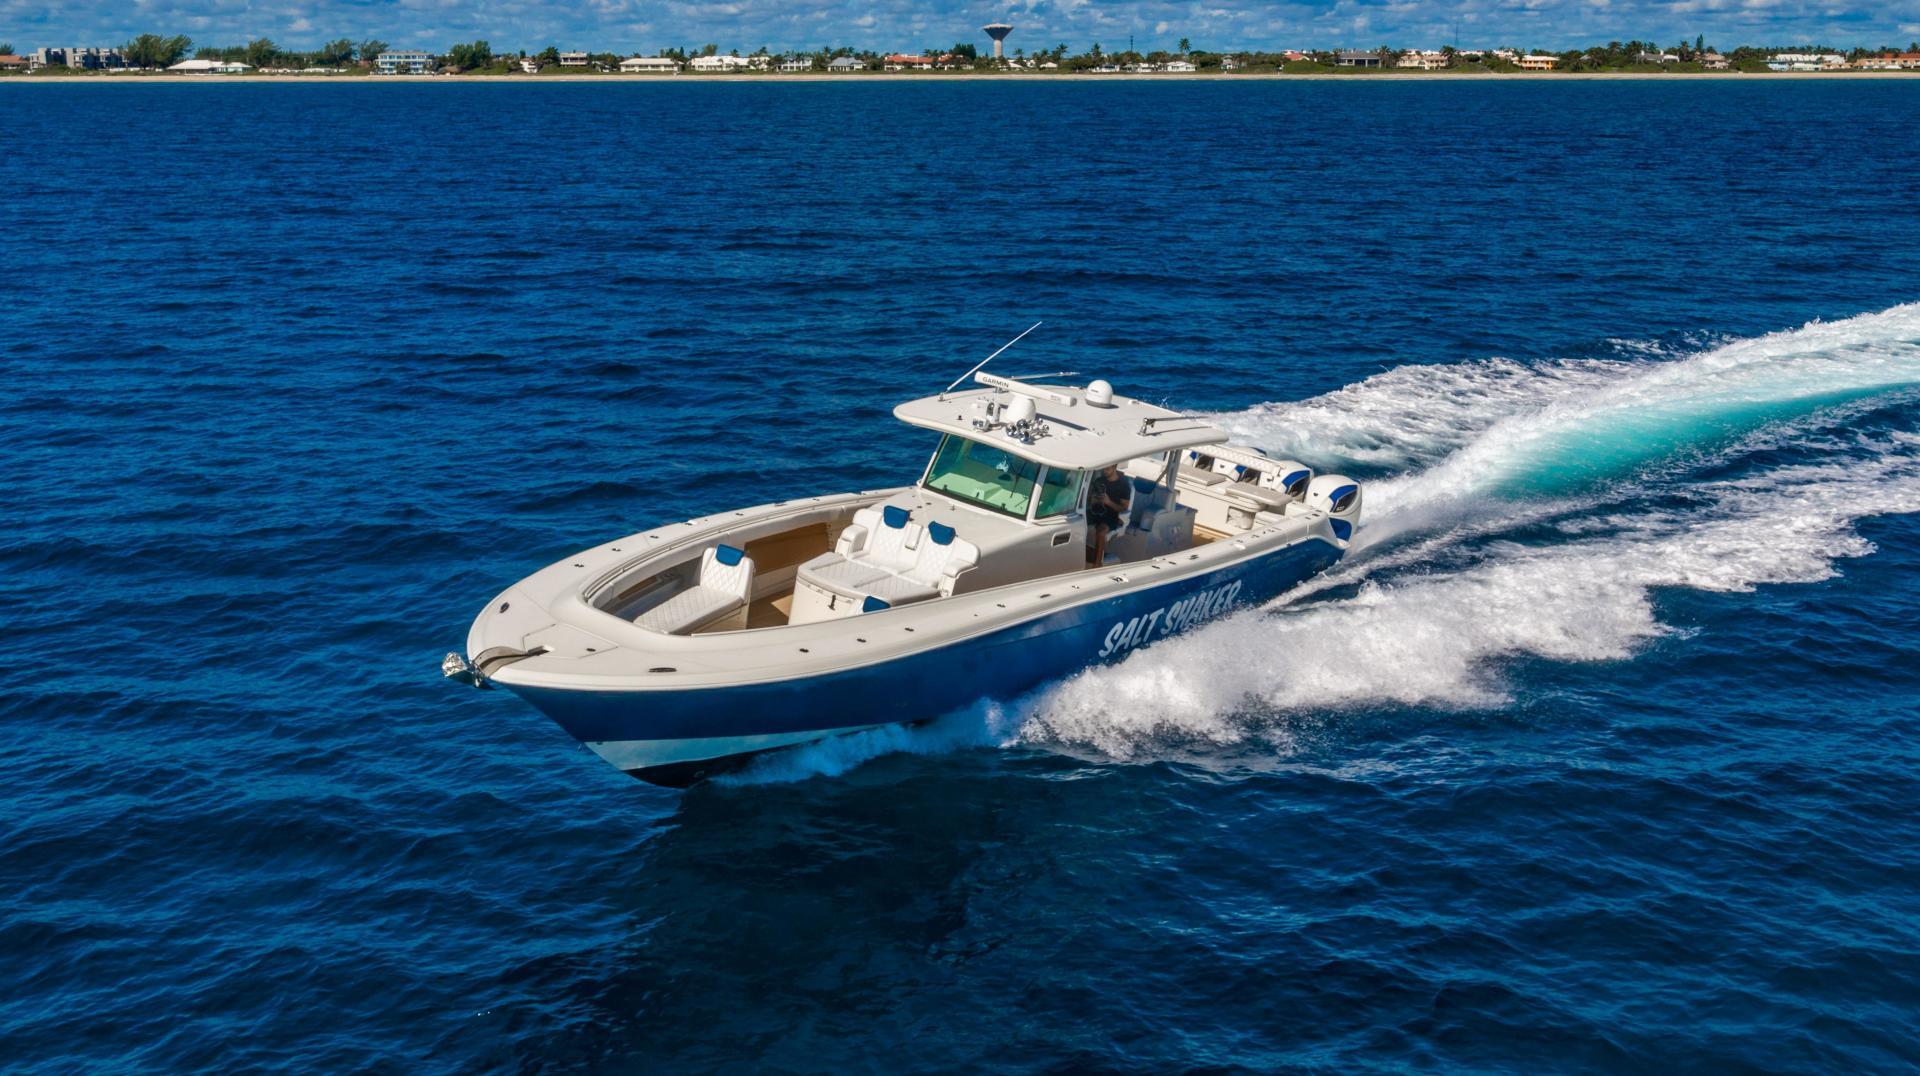 HCB-Suenos 2016-Salt Shaker Ft. Lauderdale-Florida-United States-1548629 | Thumbnail